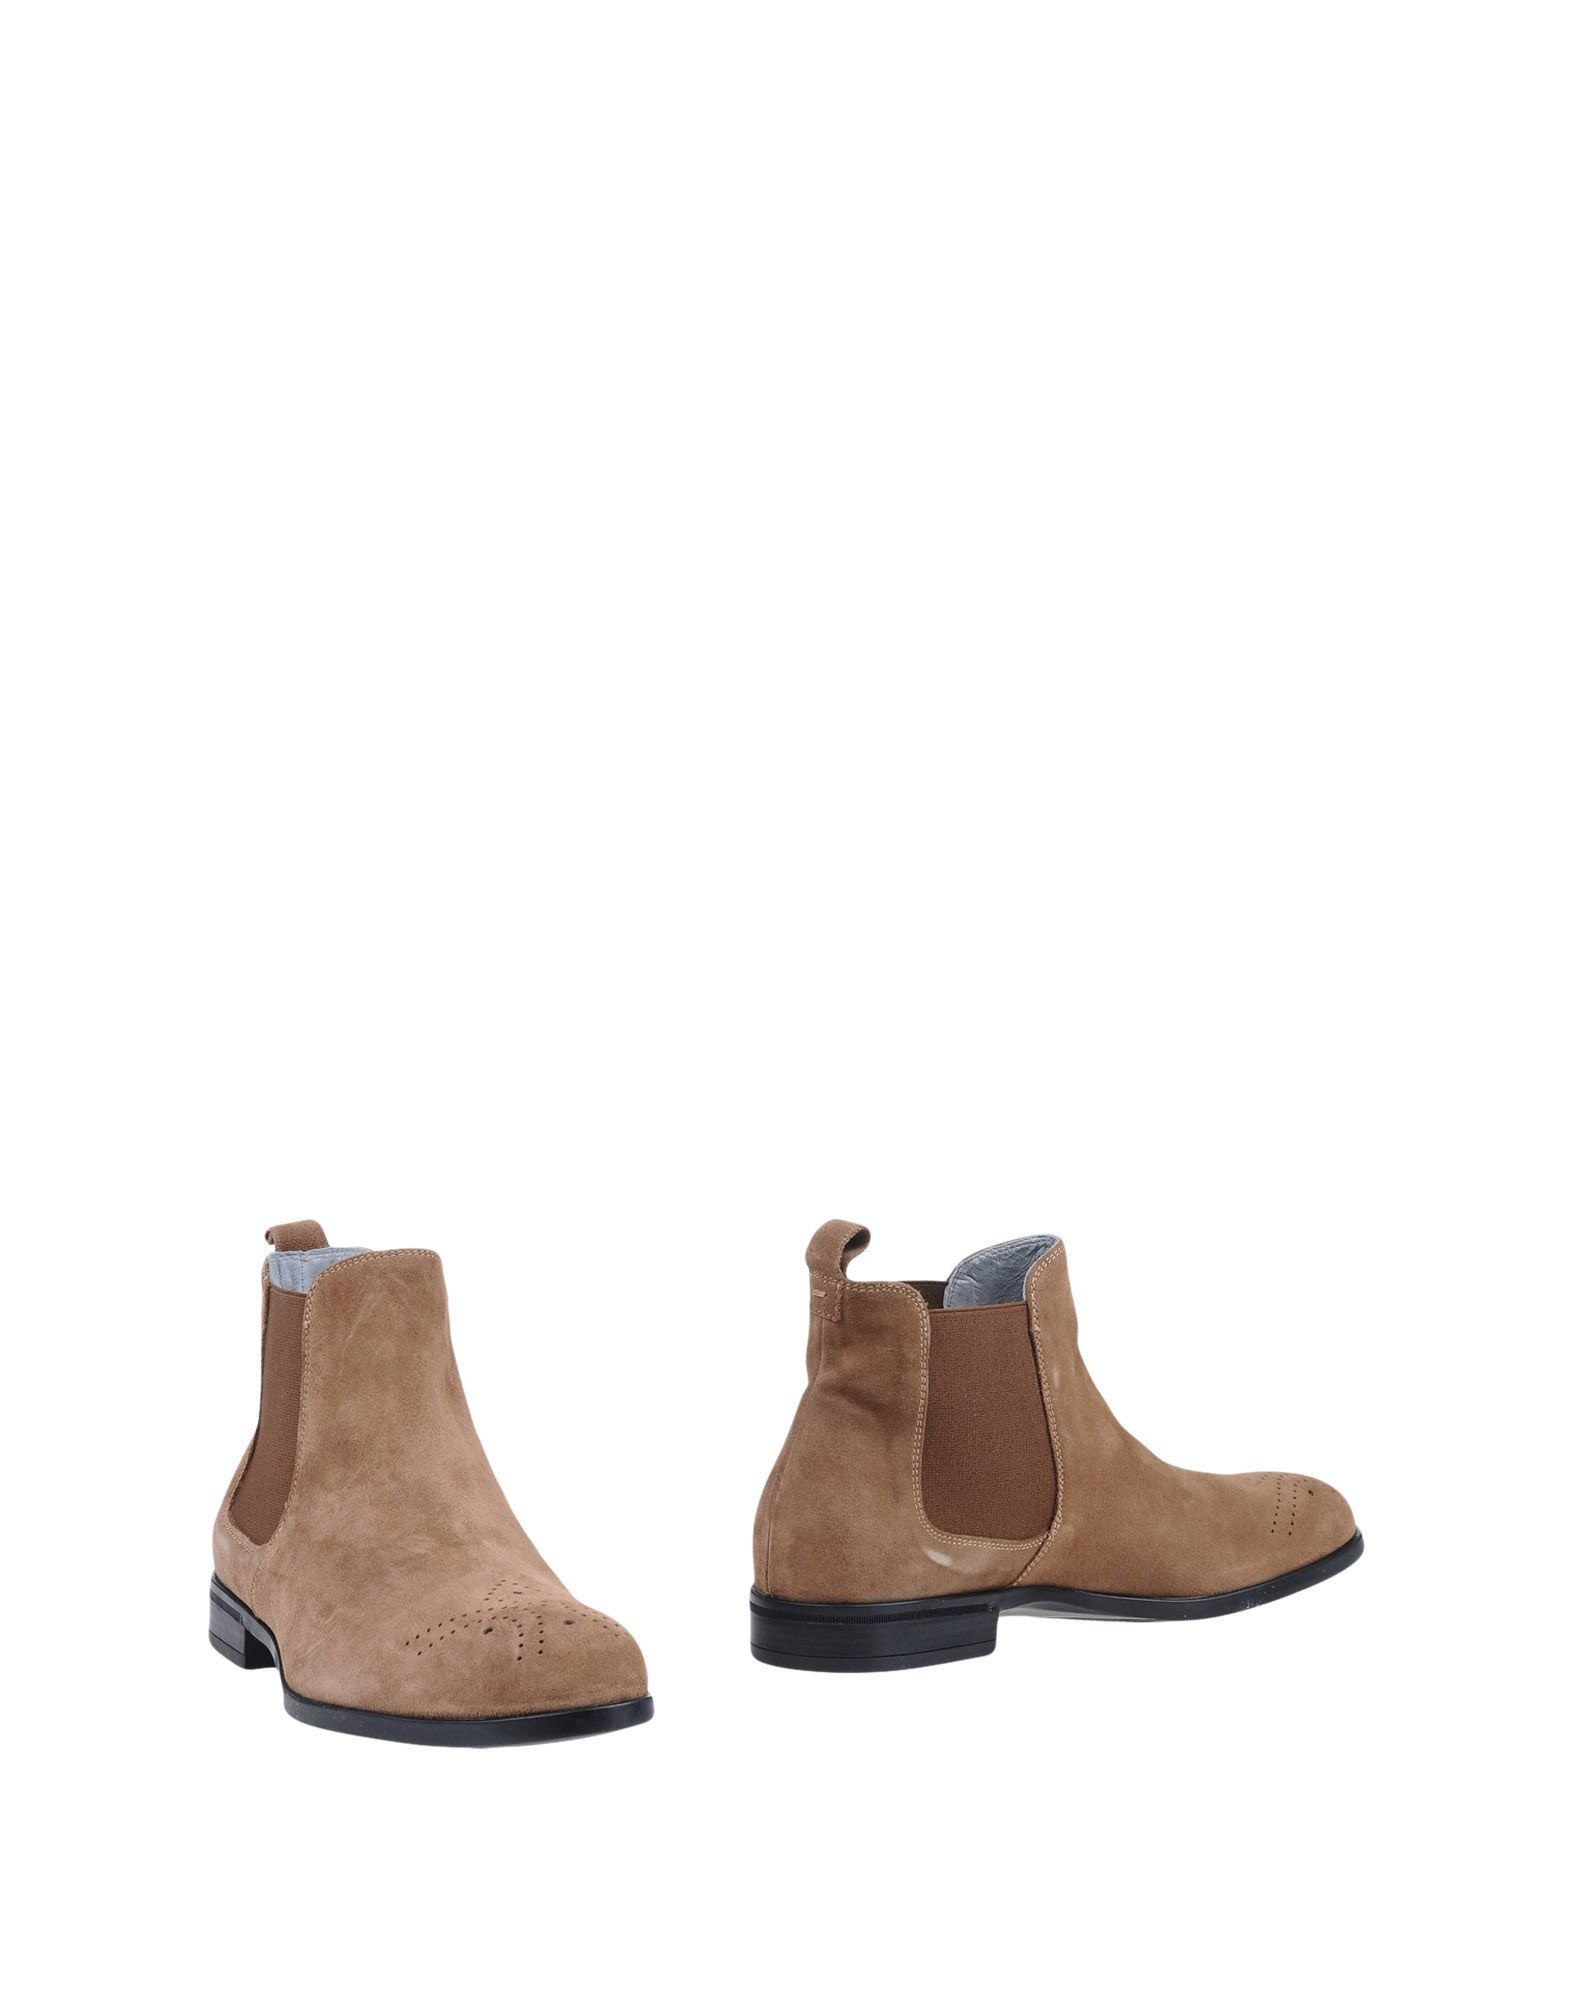 Rabatt echte Schuhe Fabiano Ricci Stiefelette Stiefelette Ricci Herren  11375503SK cbff85